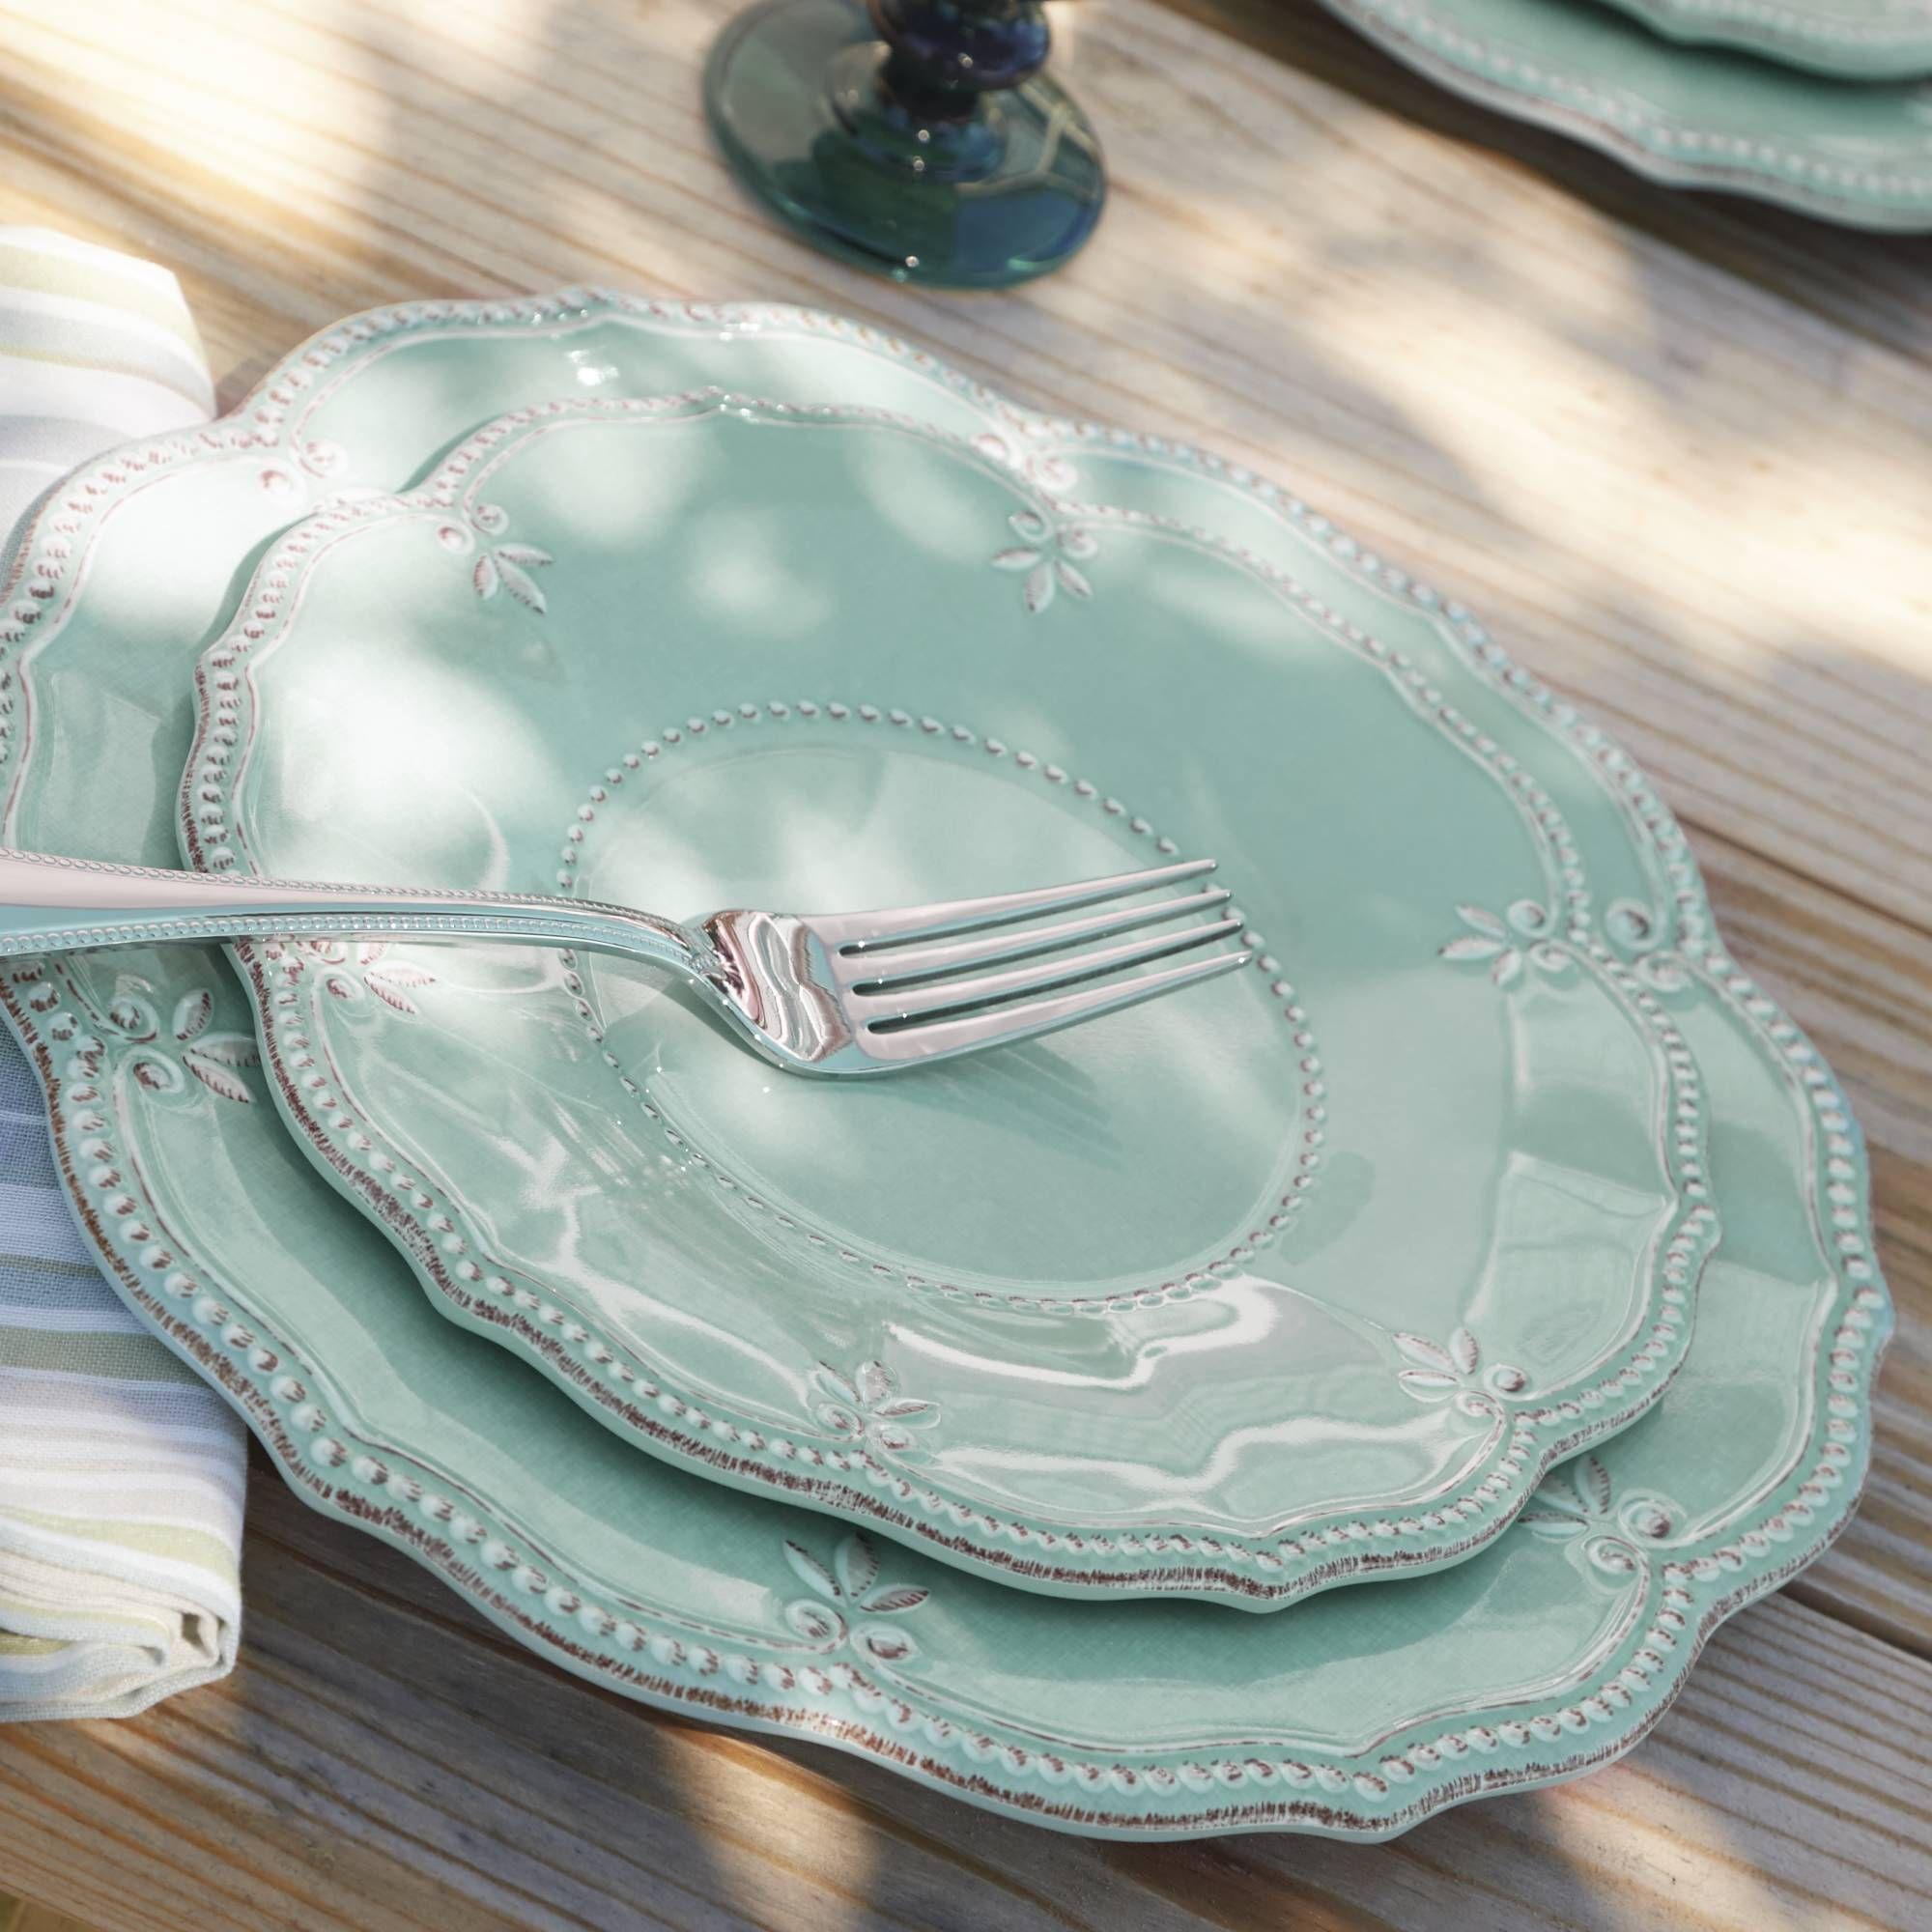 Lenox \u0026quot;French Perle\u0026quot; Aqua Melamine Dinnerware   default & Lenox \